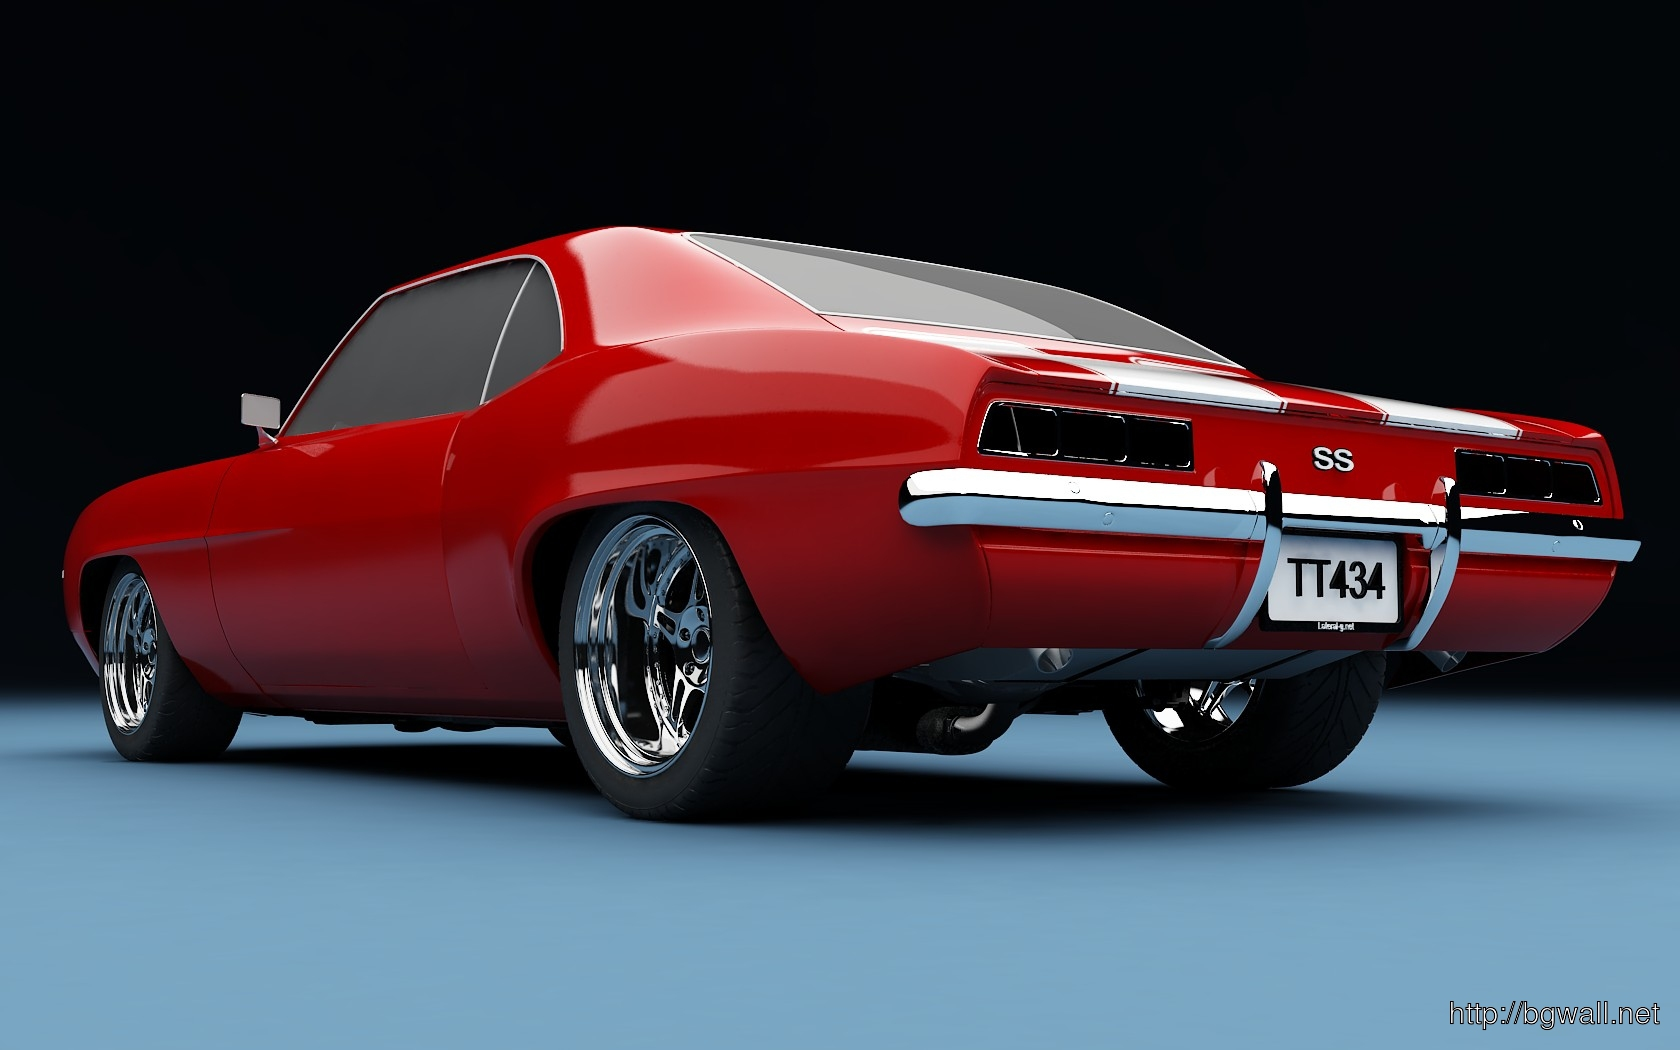 Red Camaro 1969 Muscle Car Wallpaper